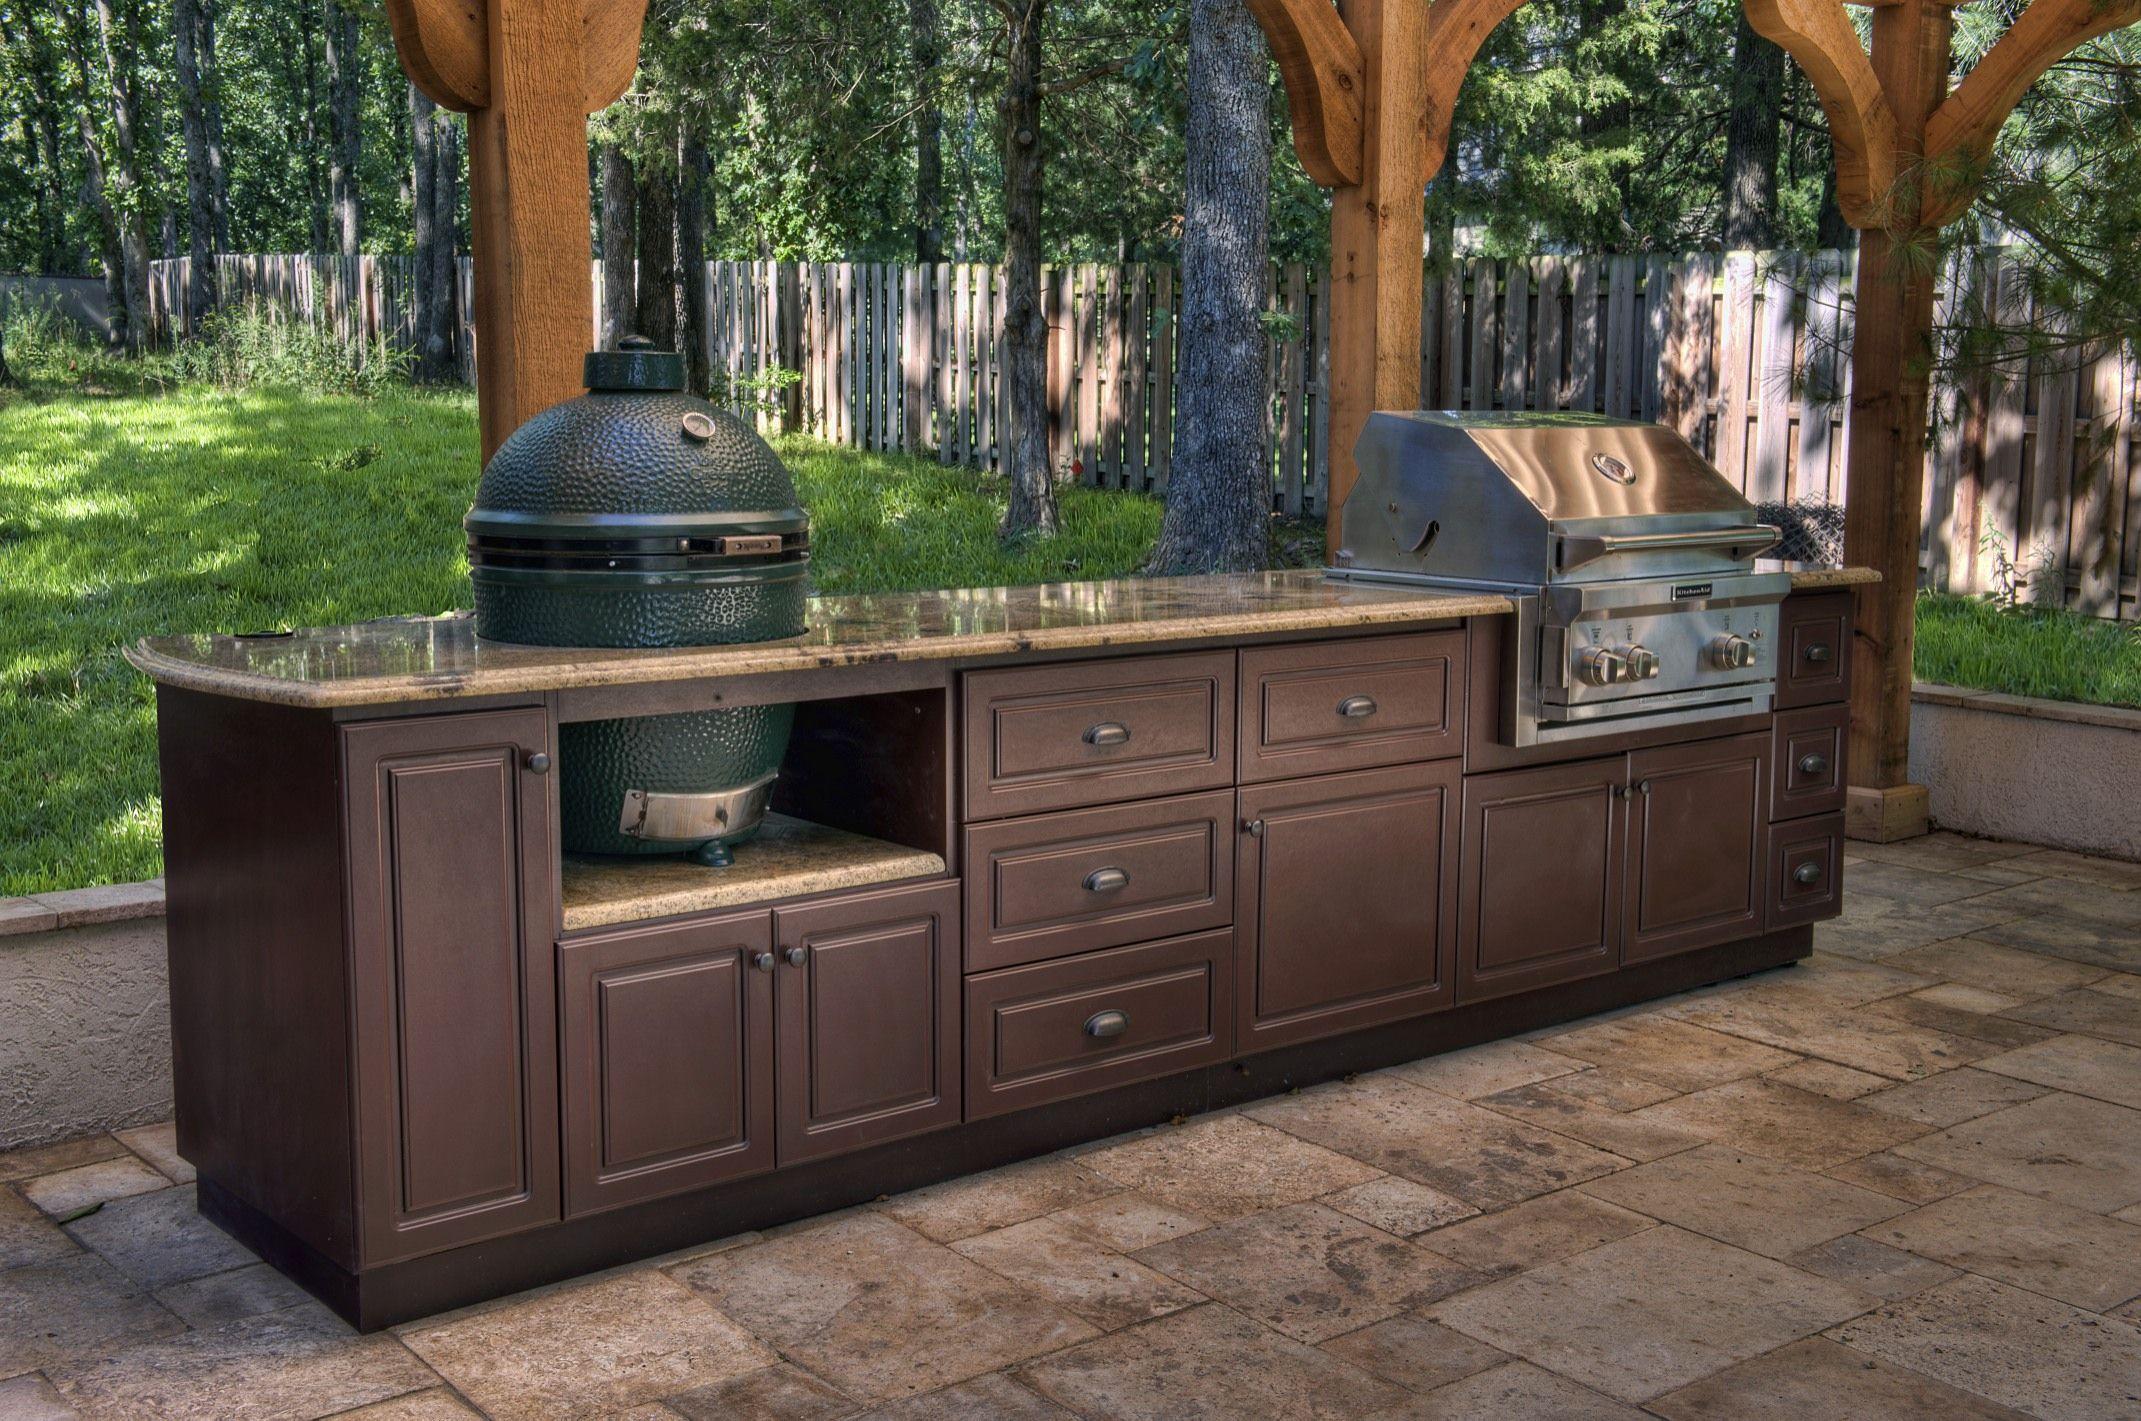 Kitchen Faqs Fireside Outdoor Kitchens Outdoor Kitchen Countertops Outdoor Cabinet Outdoor Kitchen Island